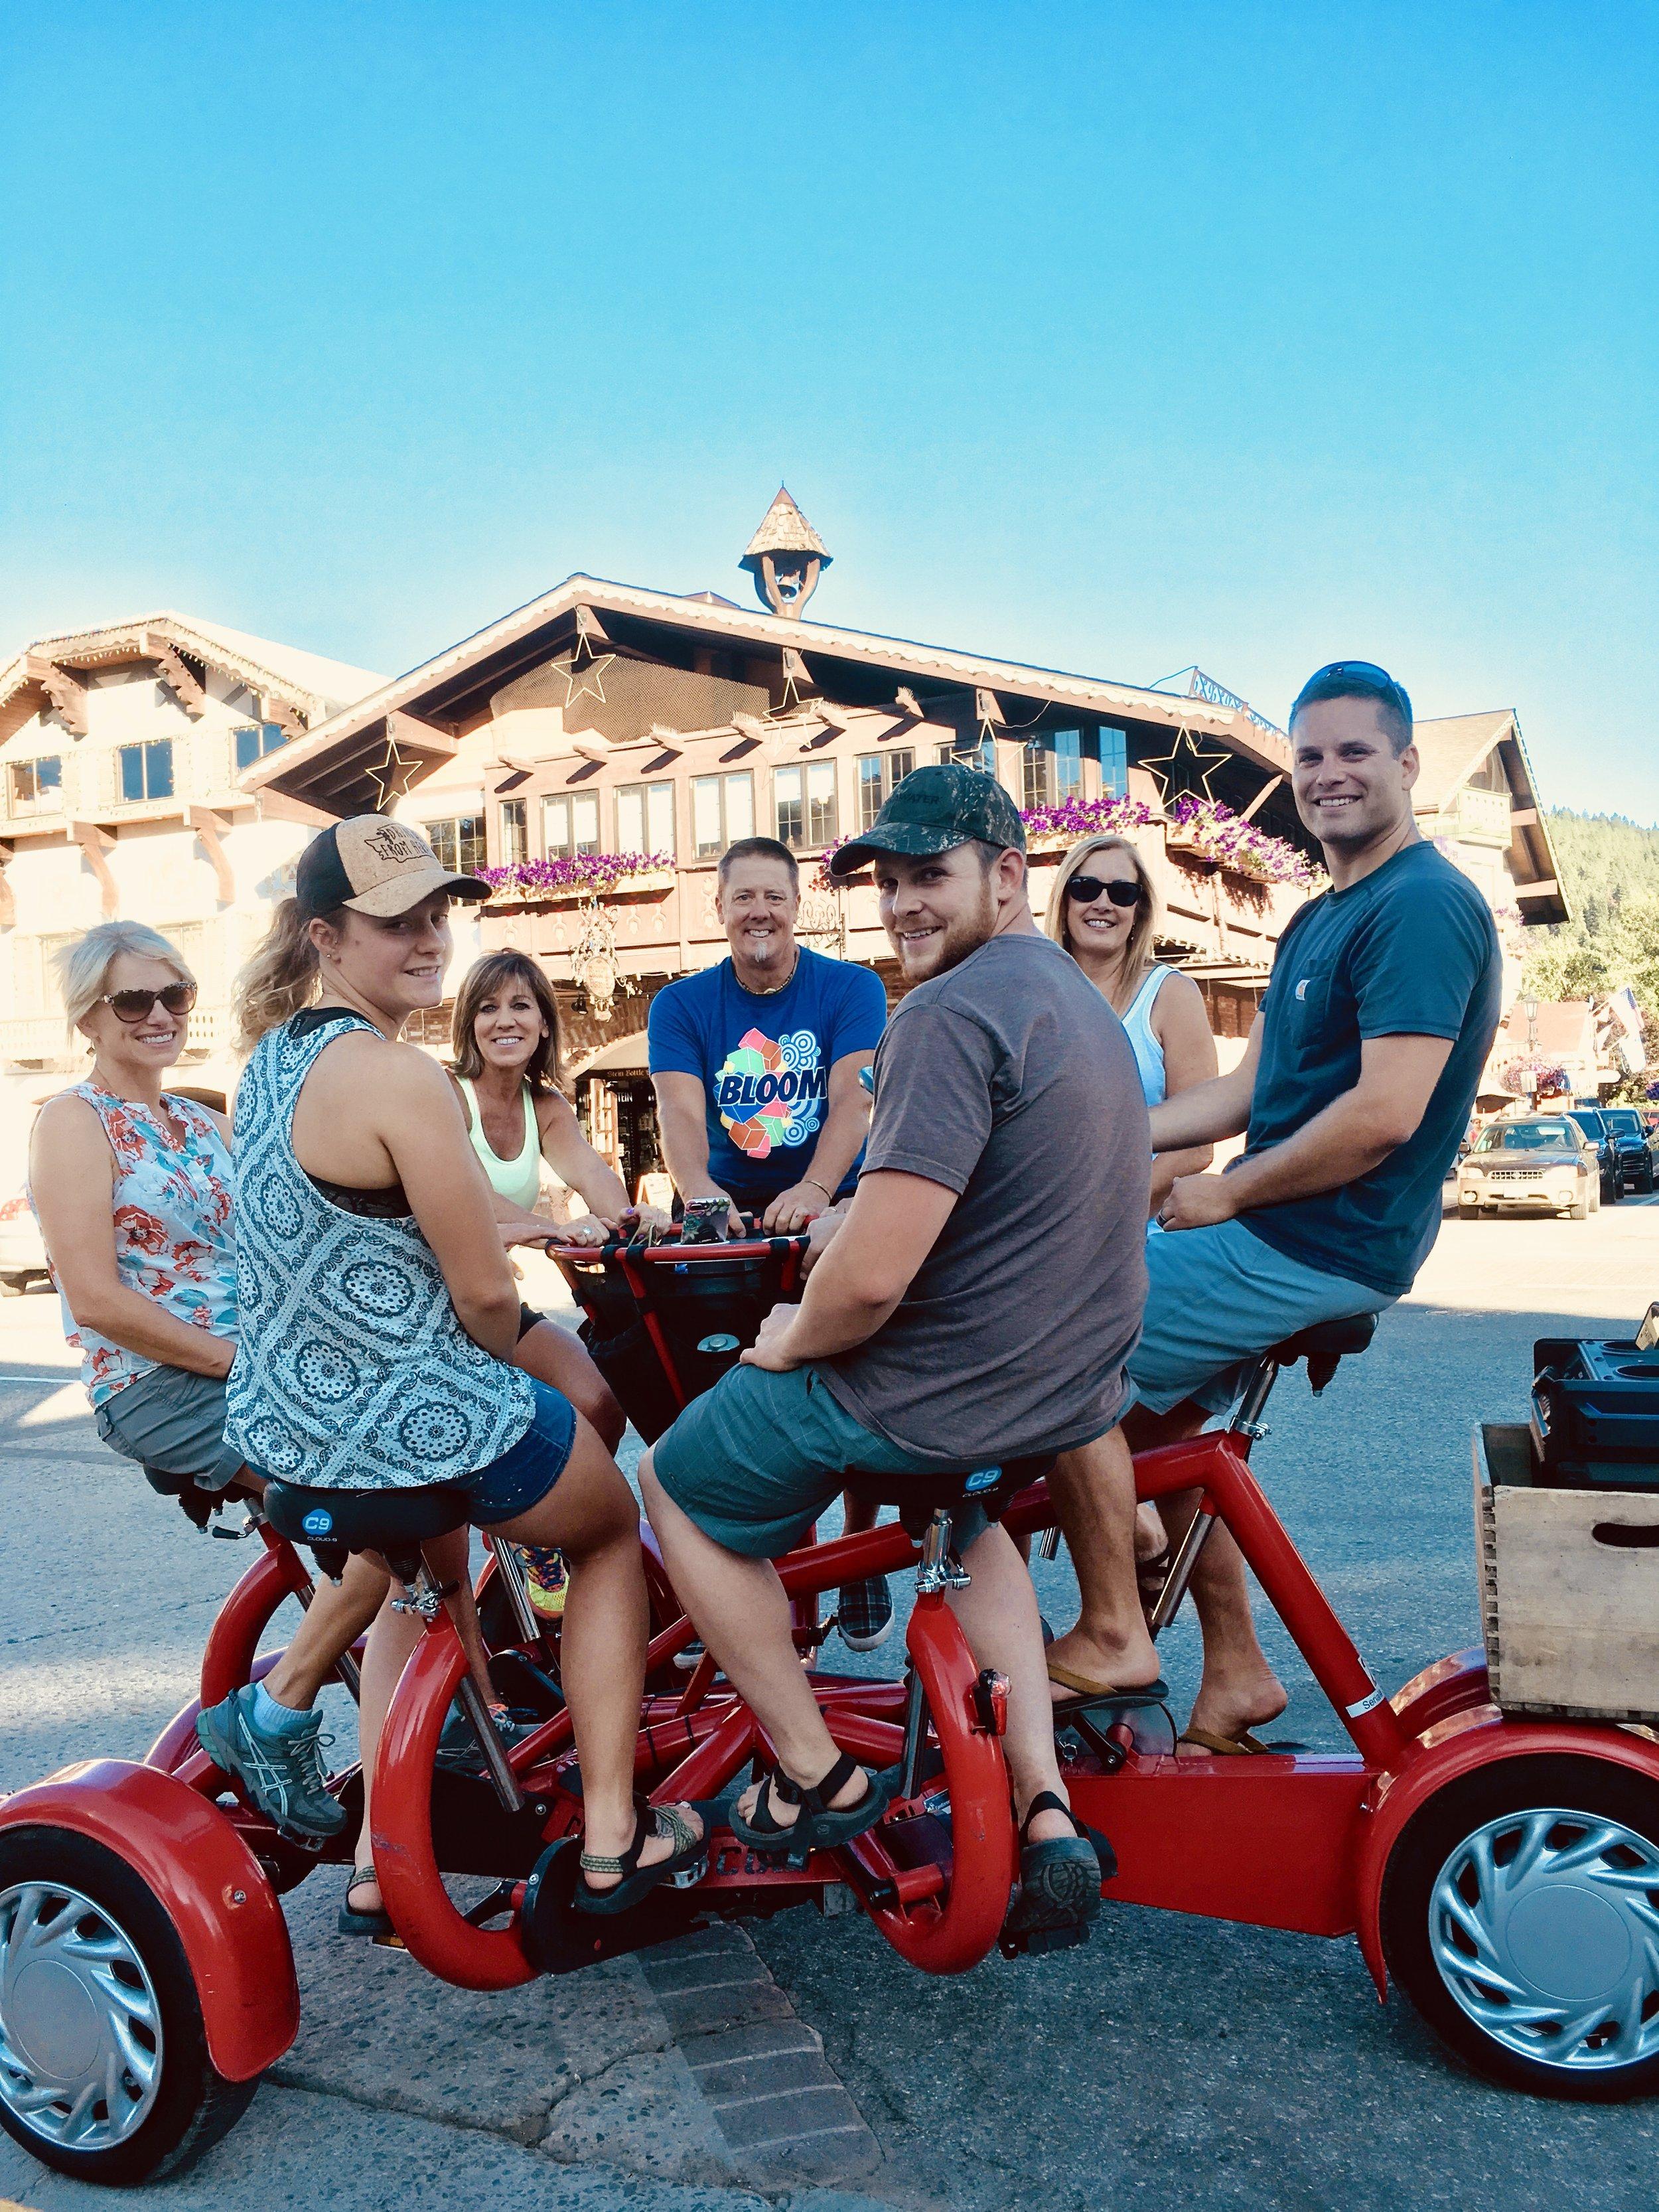 Leavenworth Radtour